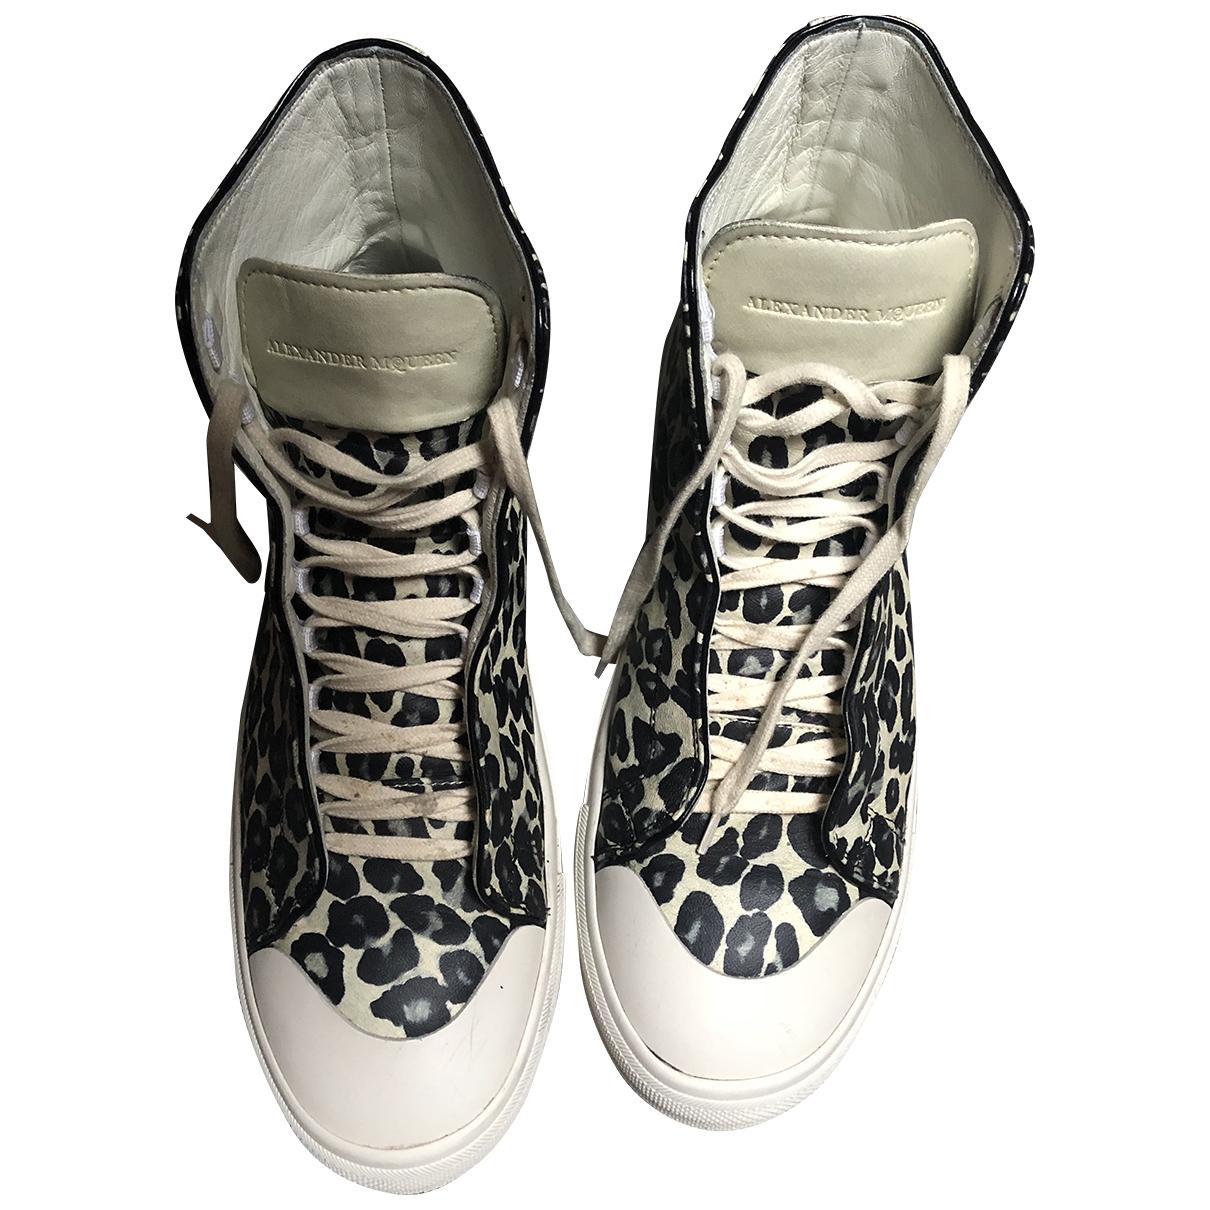 Alexander Mcqueen \N Sneakers in  Beige Leder